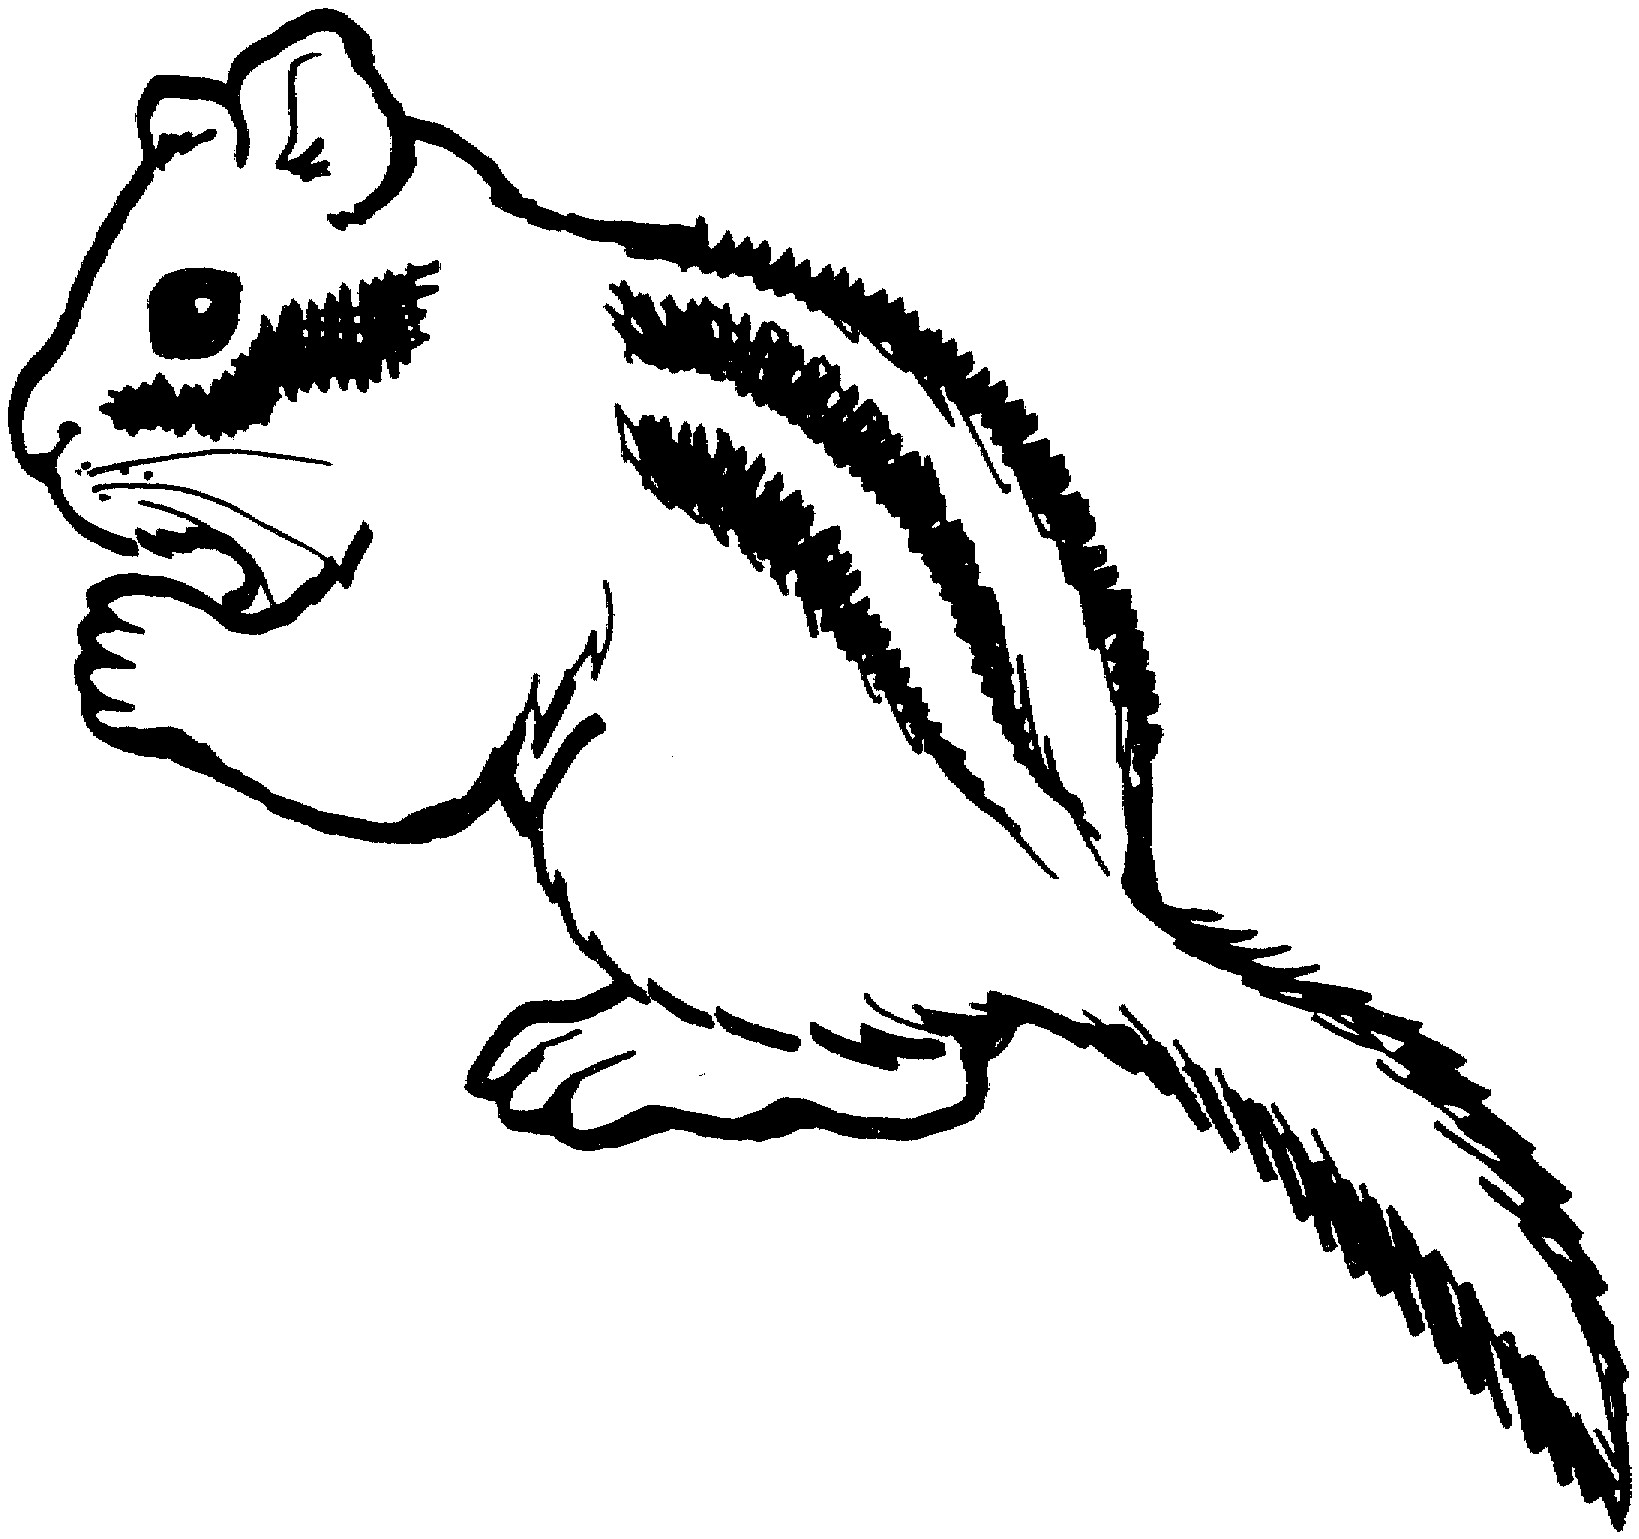 Chipmunk clipart nut, Chipmunk nut Transparent FREE for.